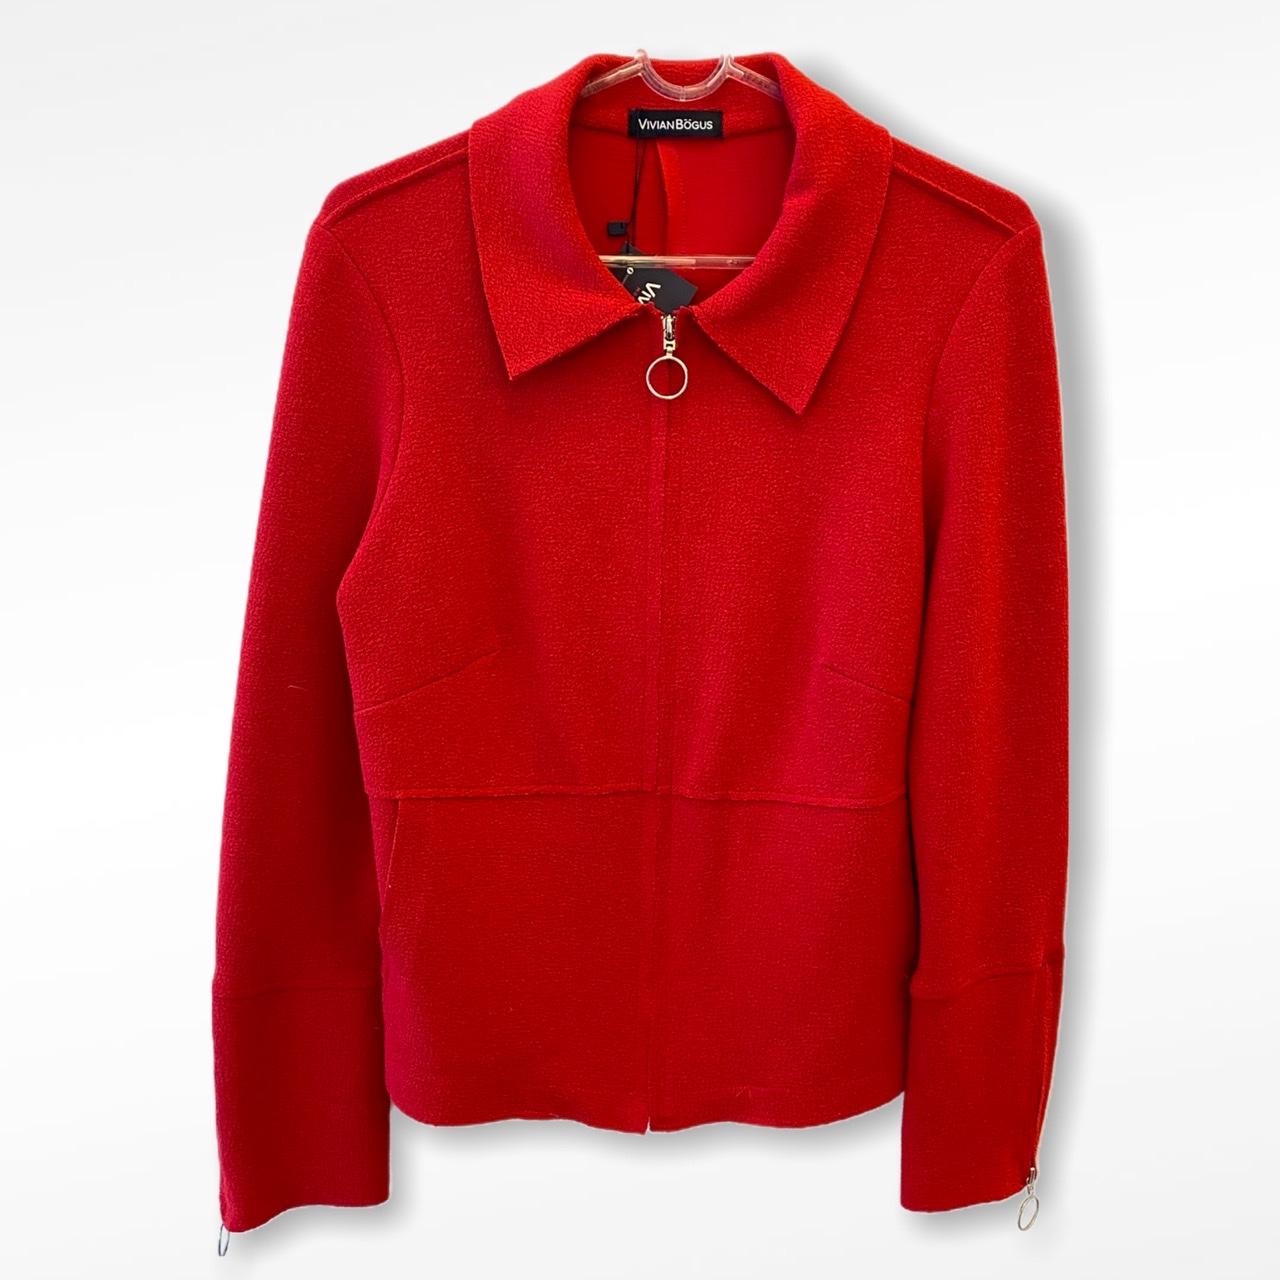 Jaqueta em buclê vermelha com zíper  - Vivian Bógus